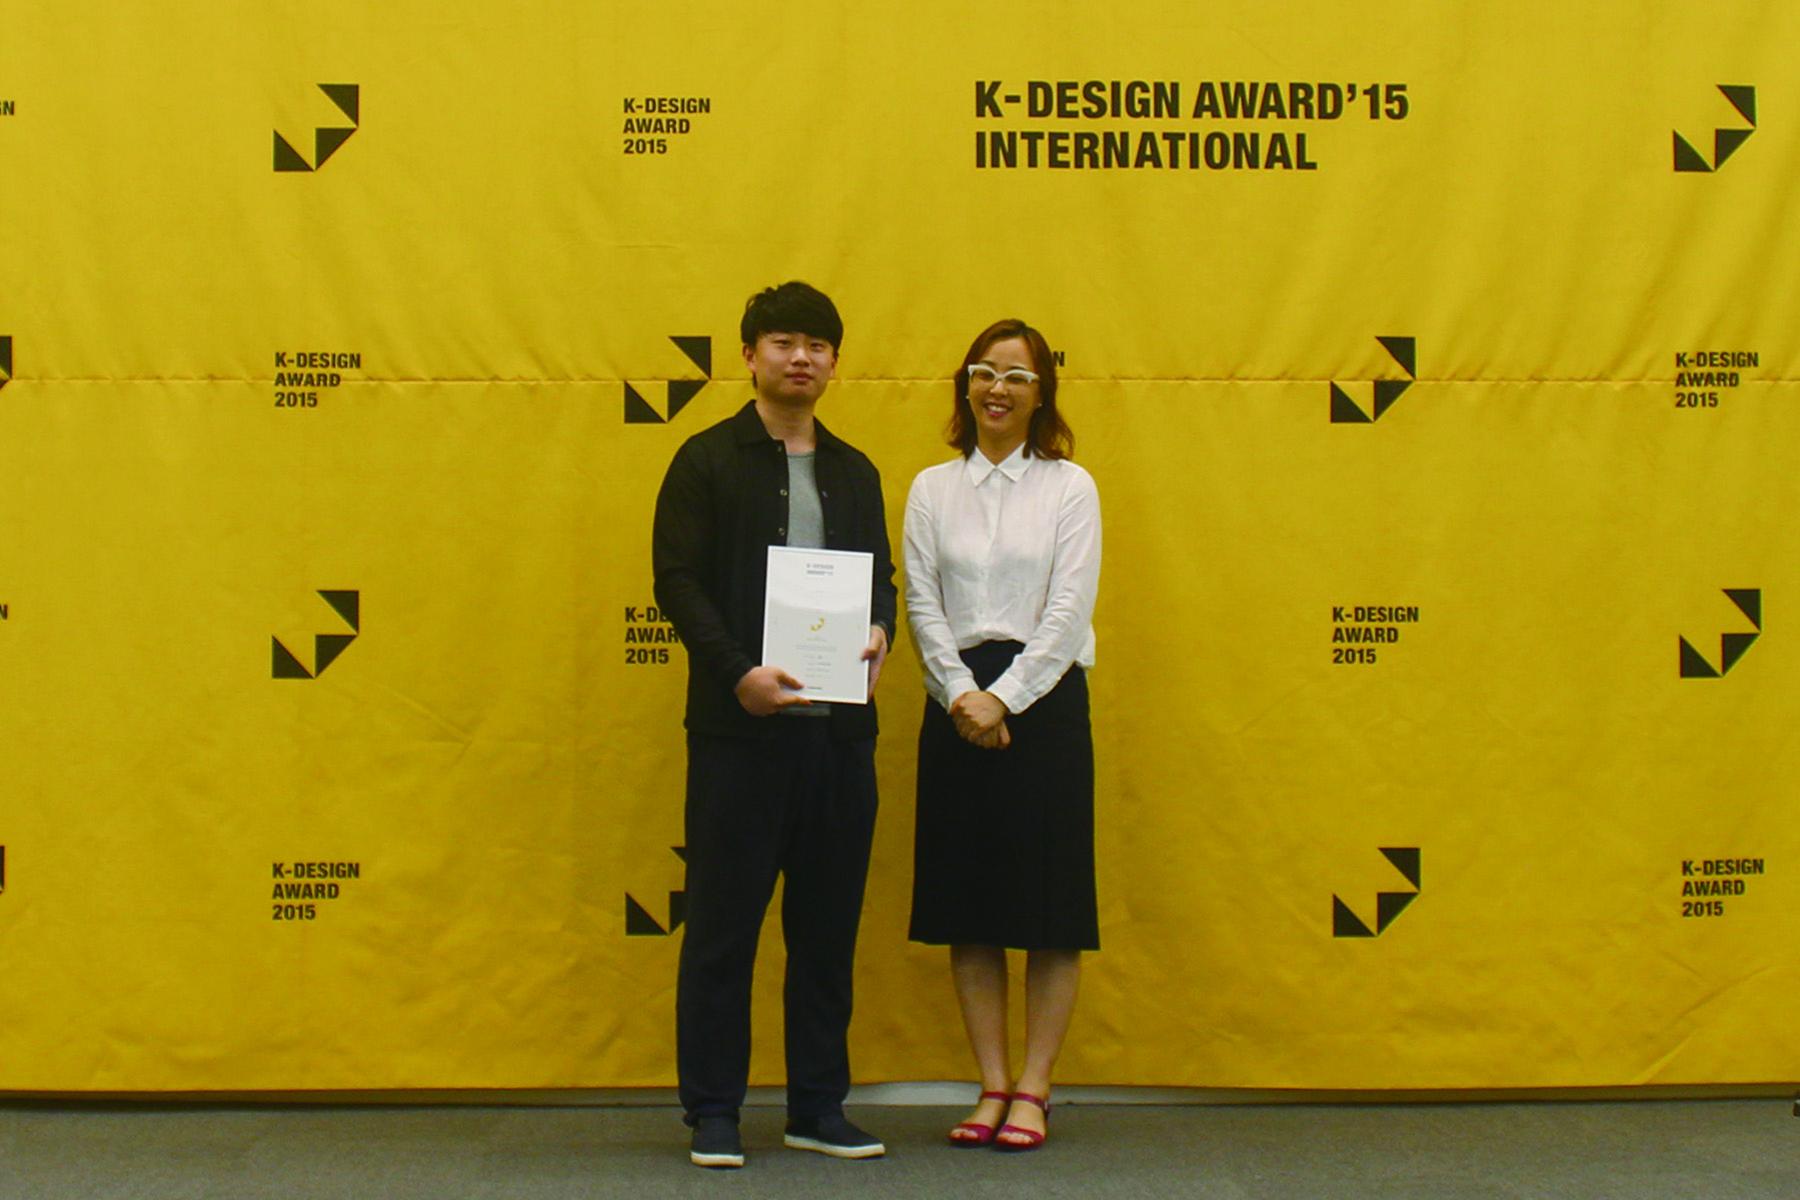 K-Design Award 2015